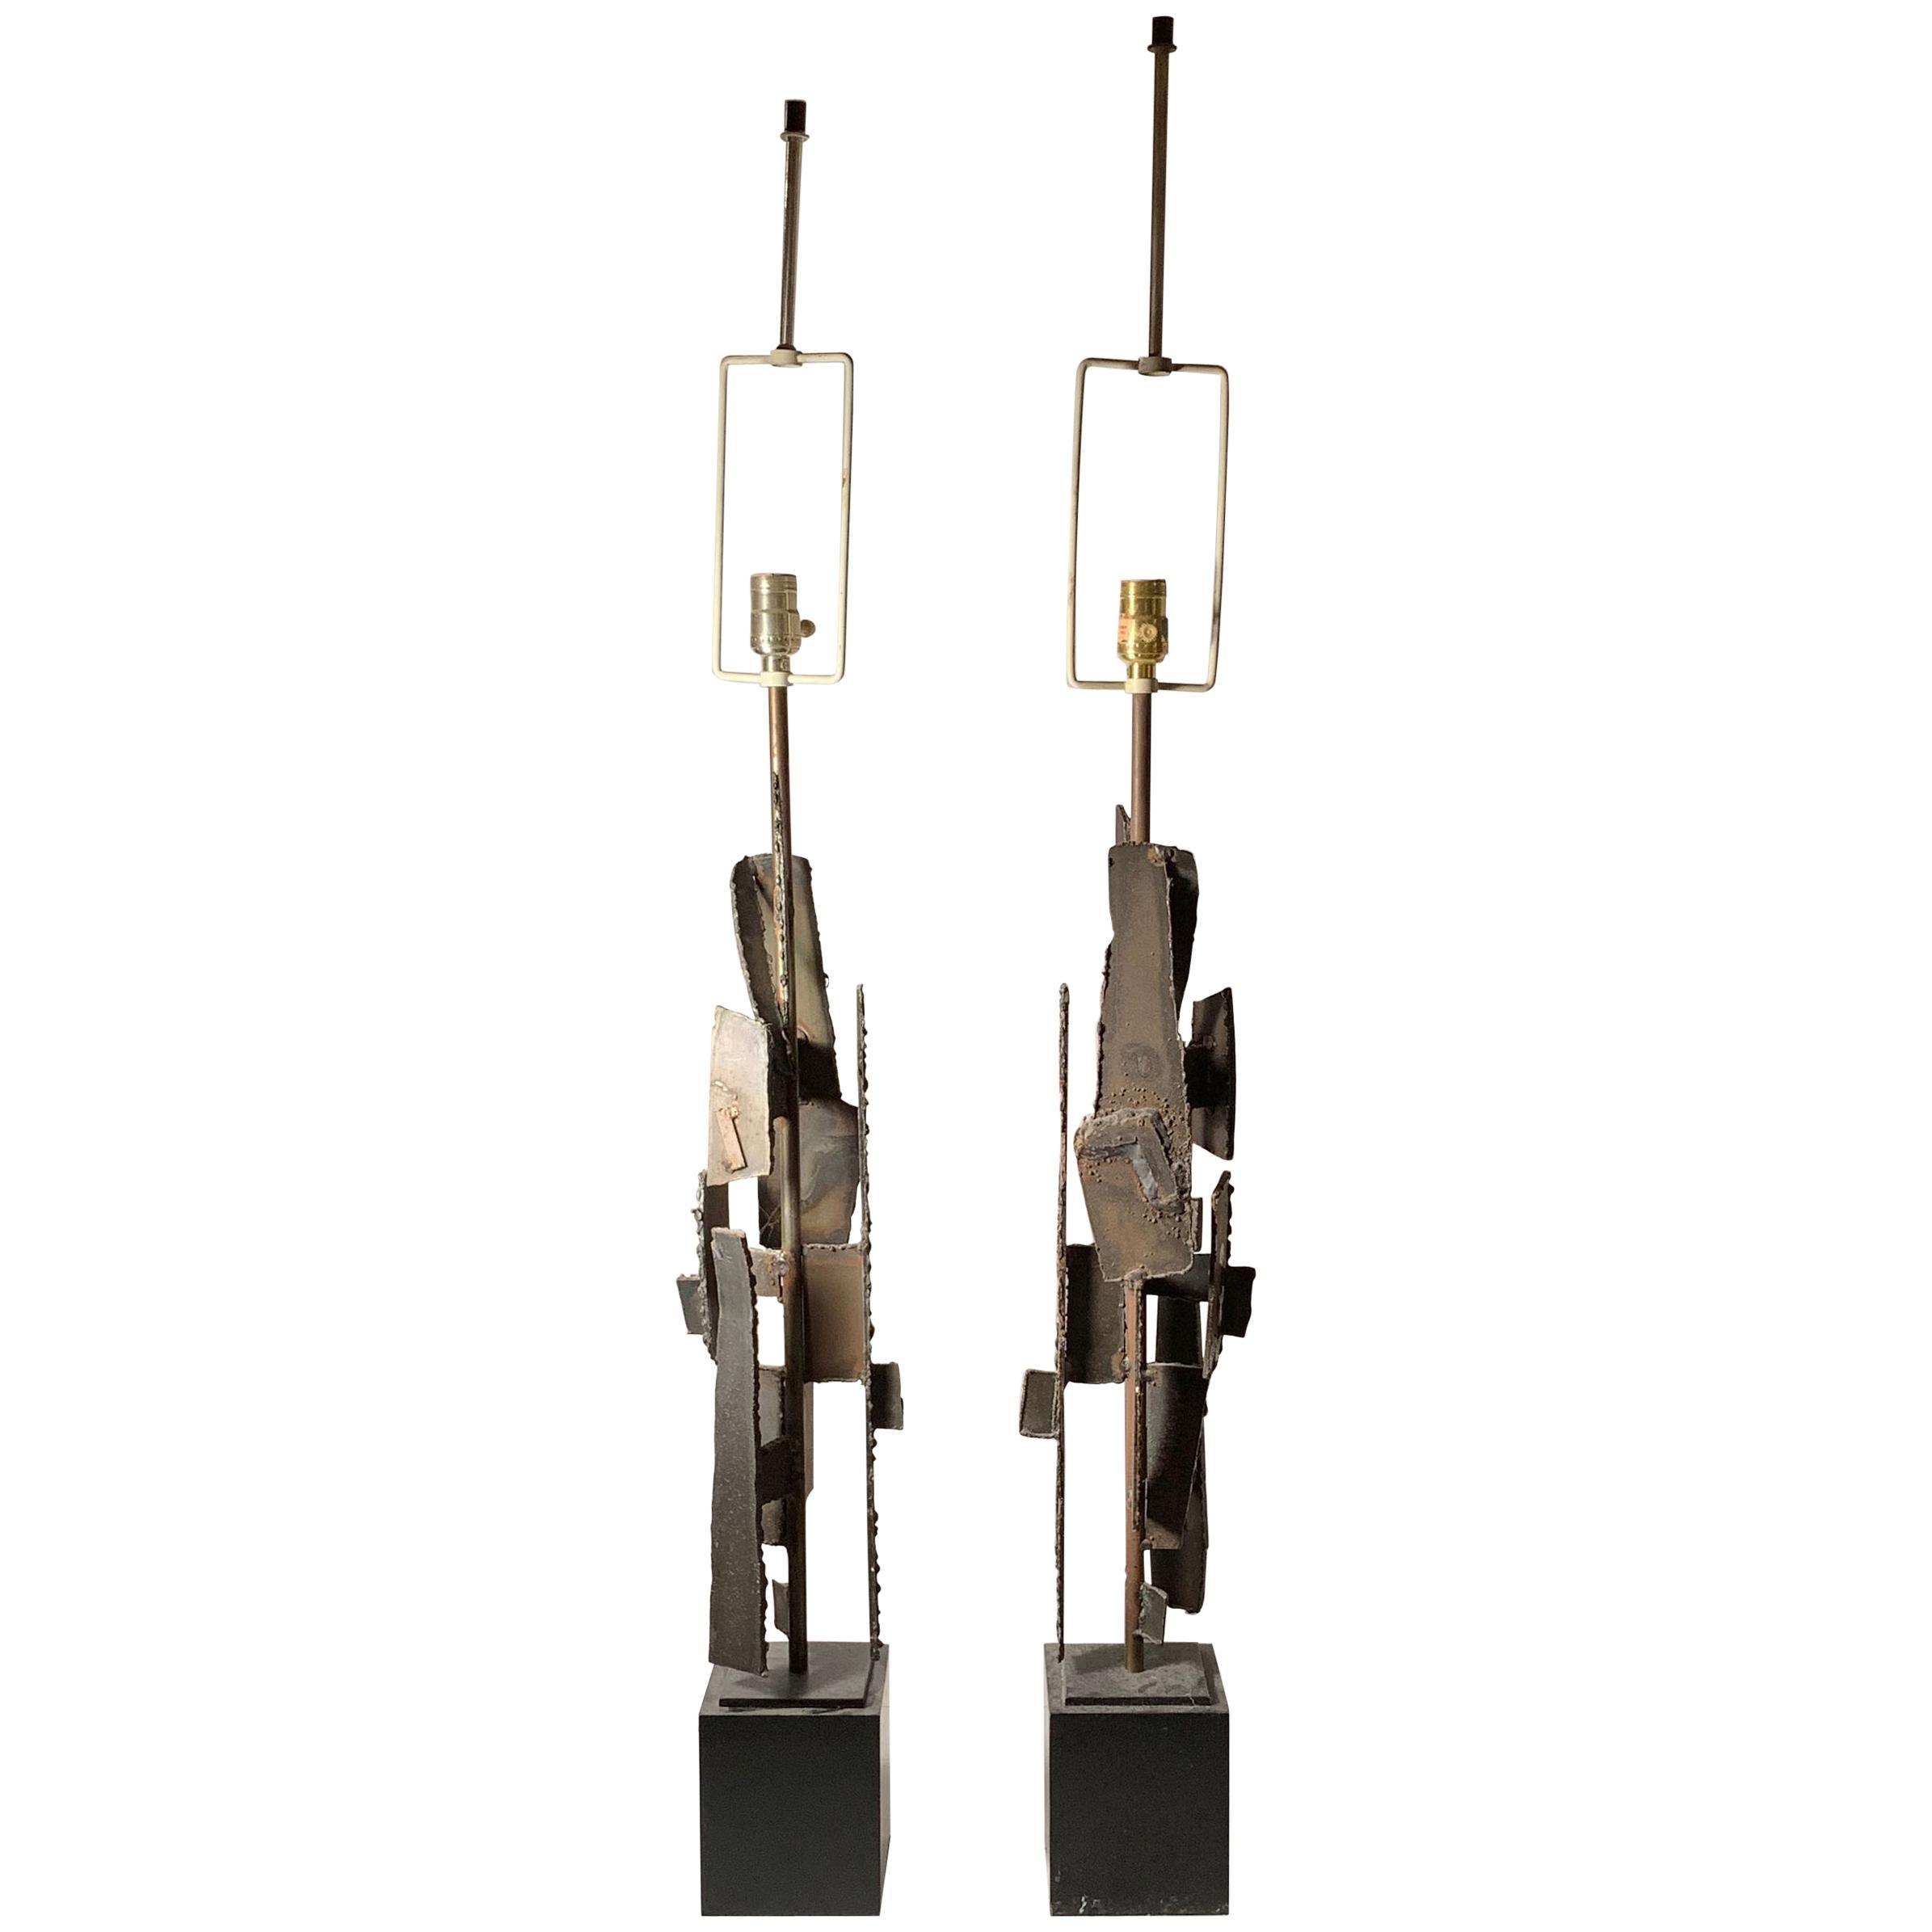 Pair of Richard Barr Brutalist Table Lamps Laurel Lamp Company